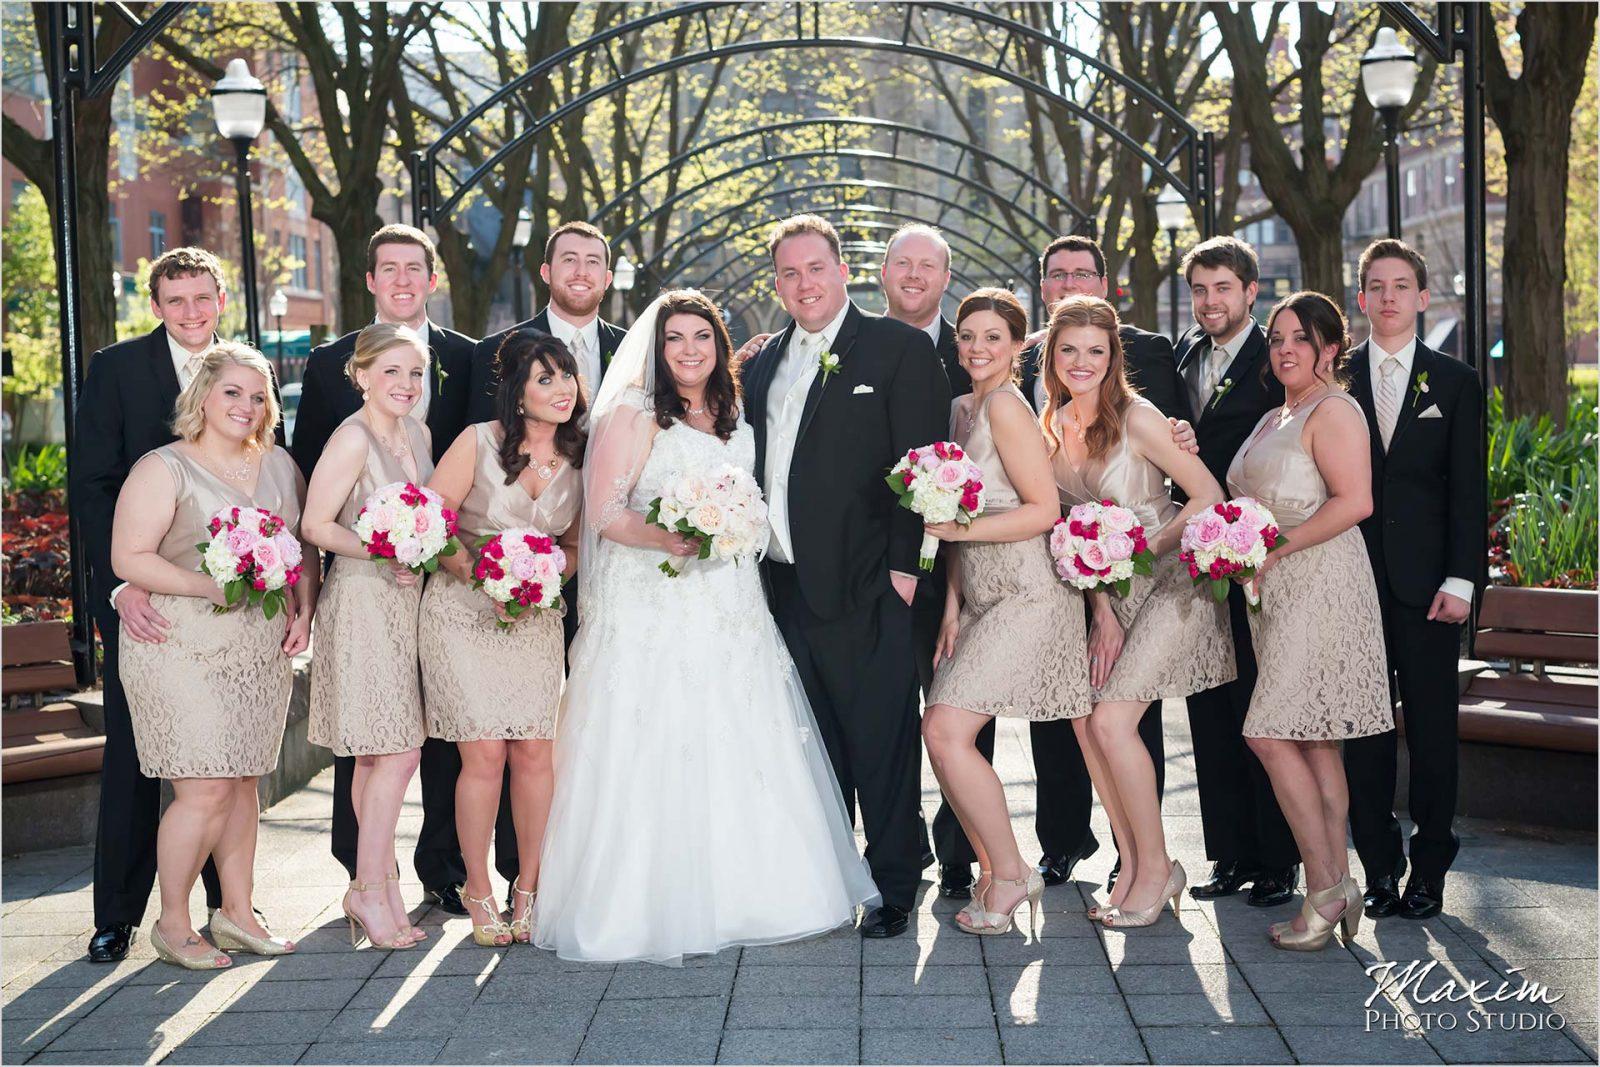 The Phoenix Cincinnati Wedding, Garfield Park, Cincinnati Bride Groom